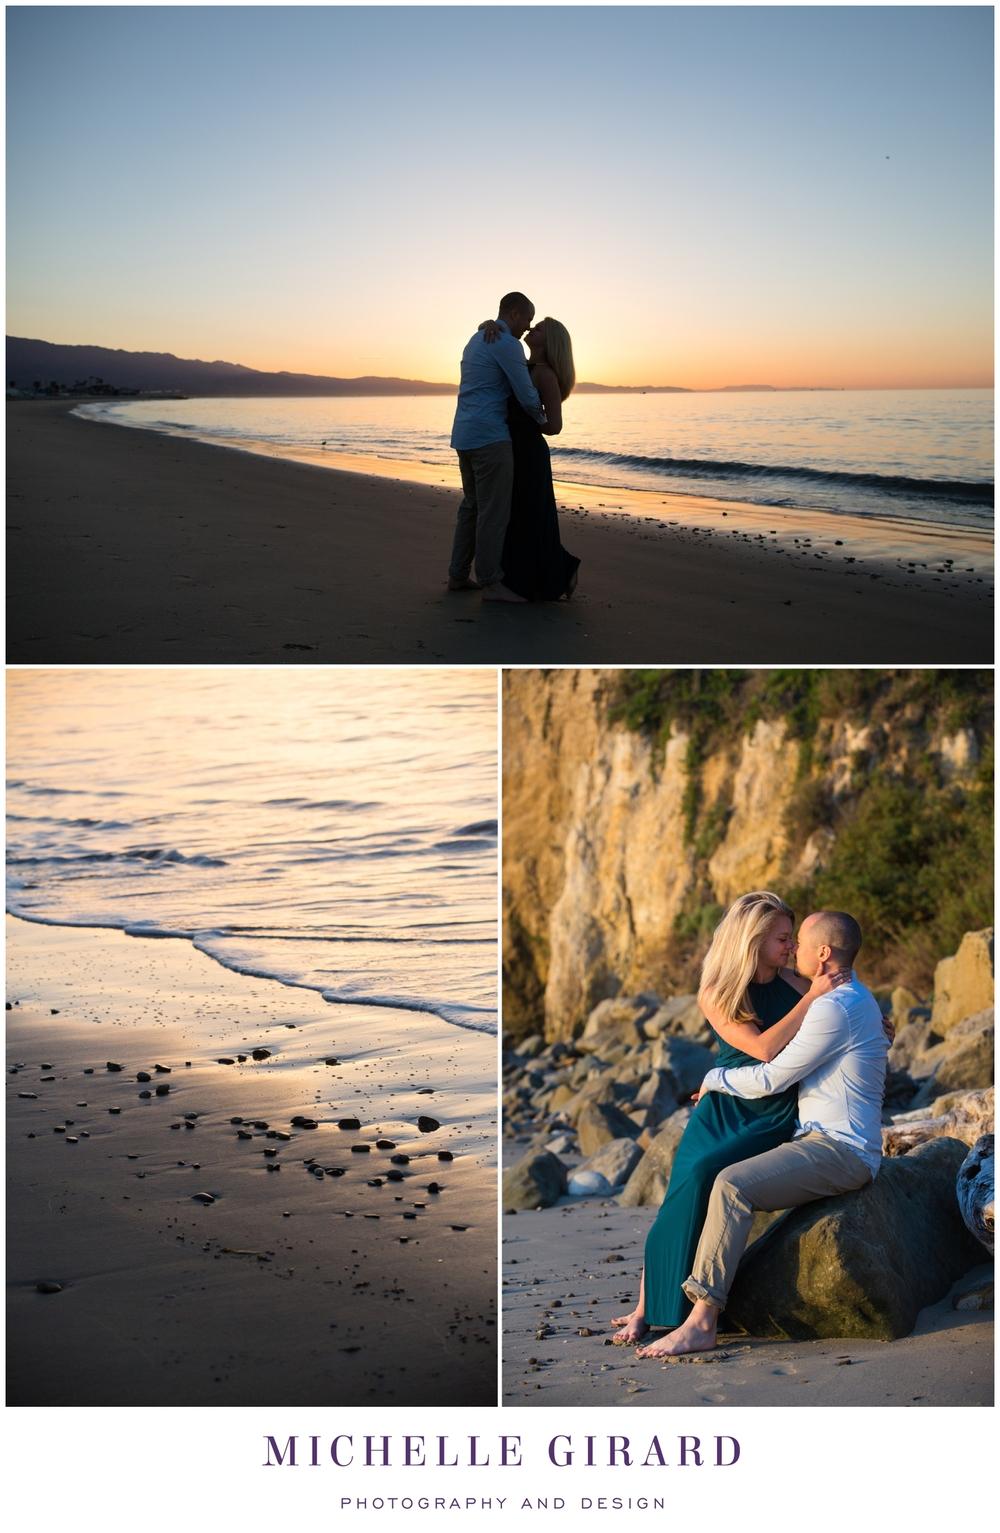 santa-barbara-california-engagement-photography-sunrise-theater-beach-michelle-girard06.jpg